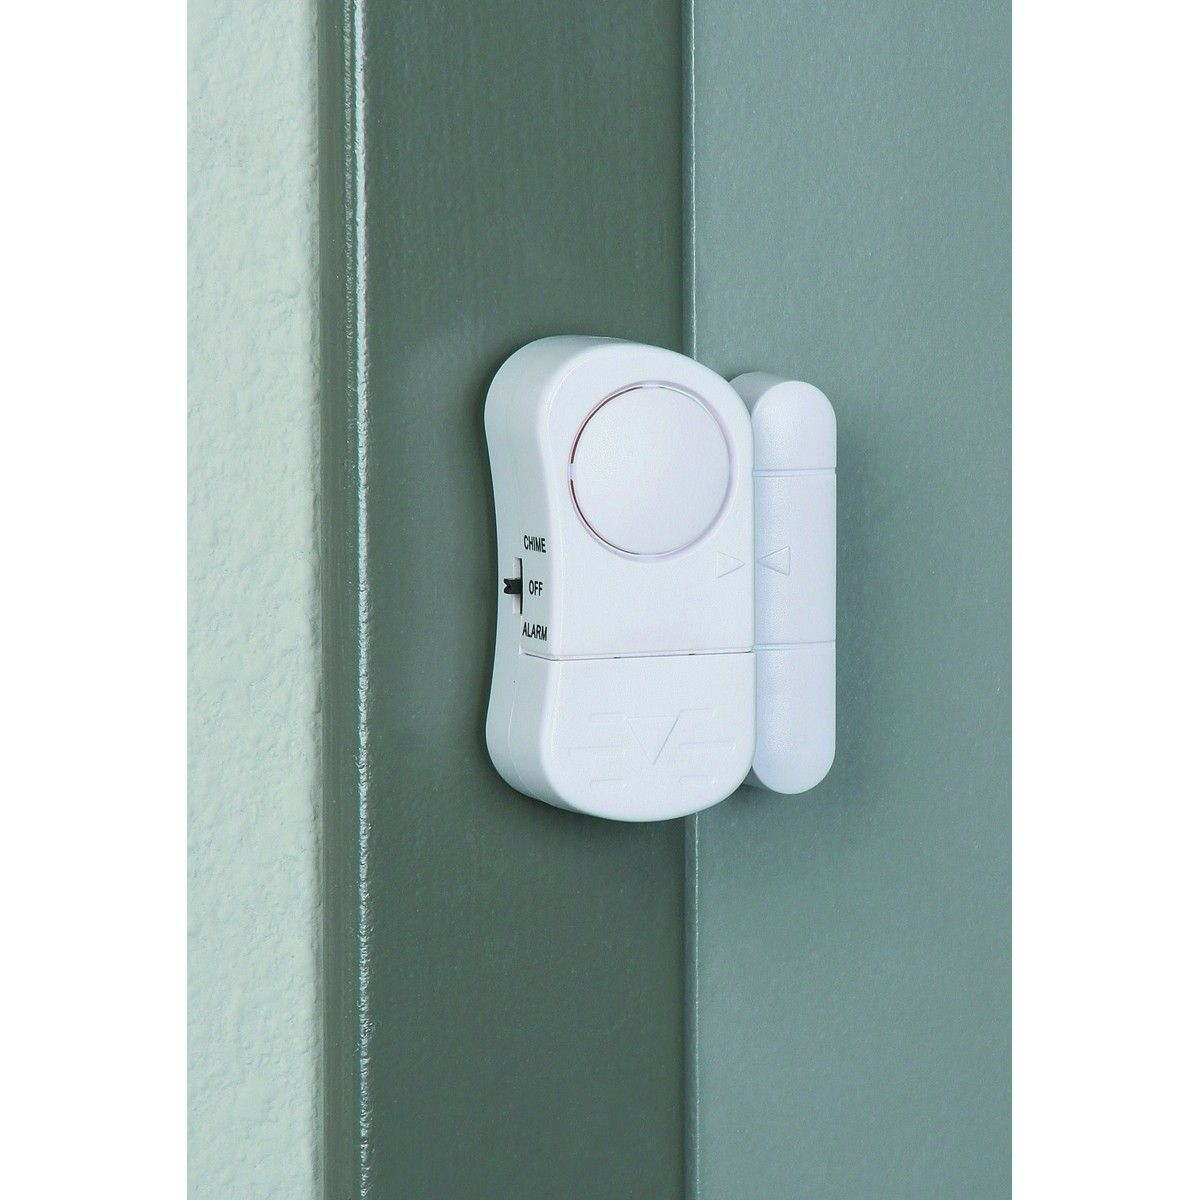 Door Entry Security Alarm Httpfranzdondi Pinterest